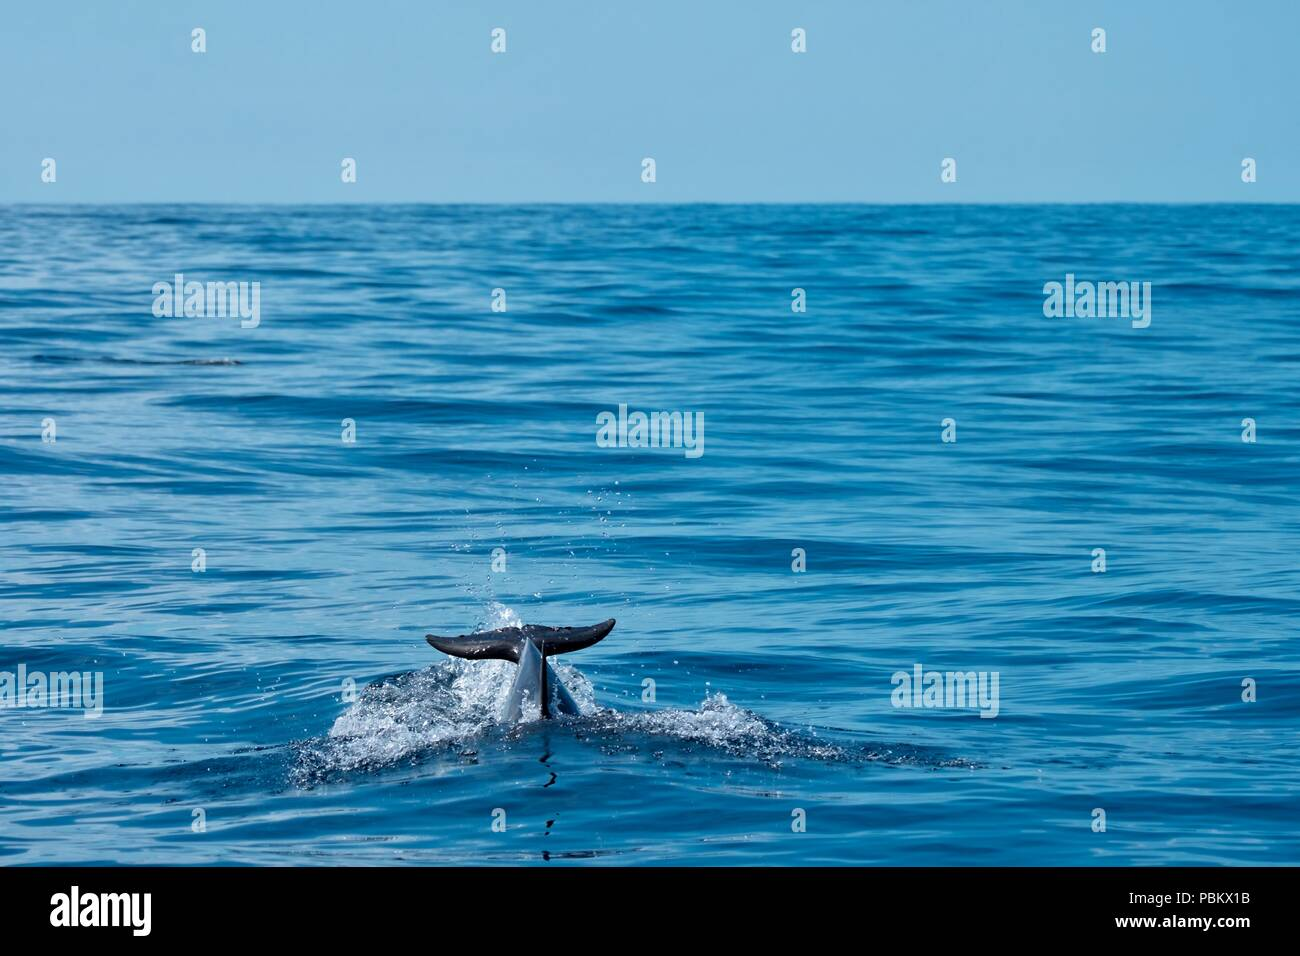 Common dolphin speeding through the ocean - Stock Image